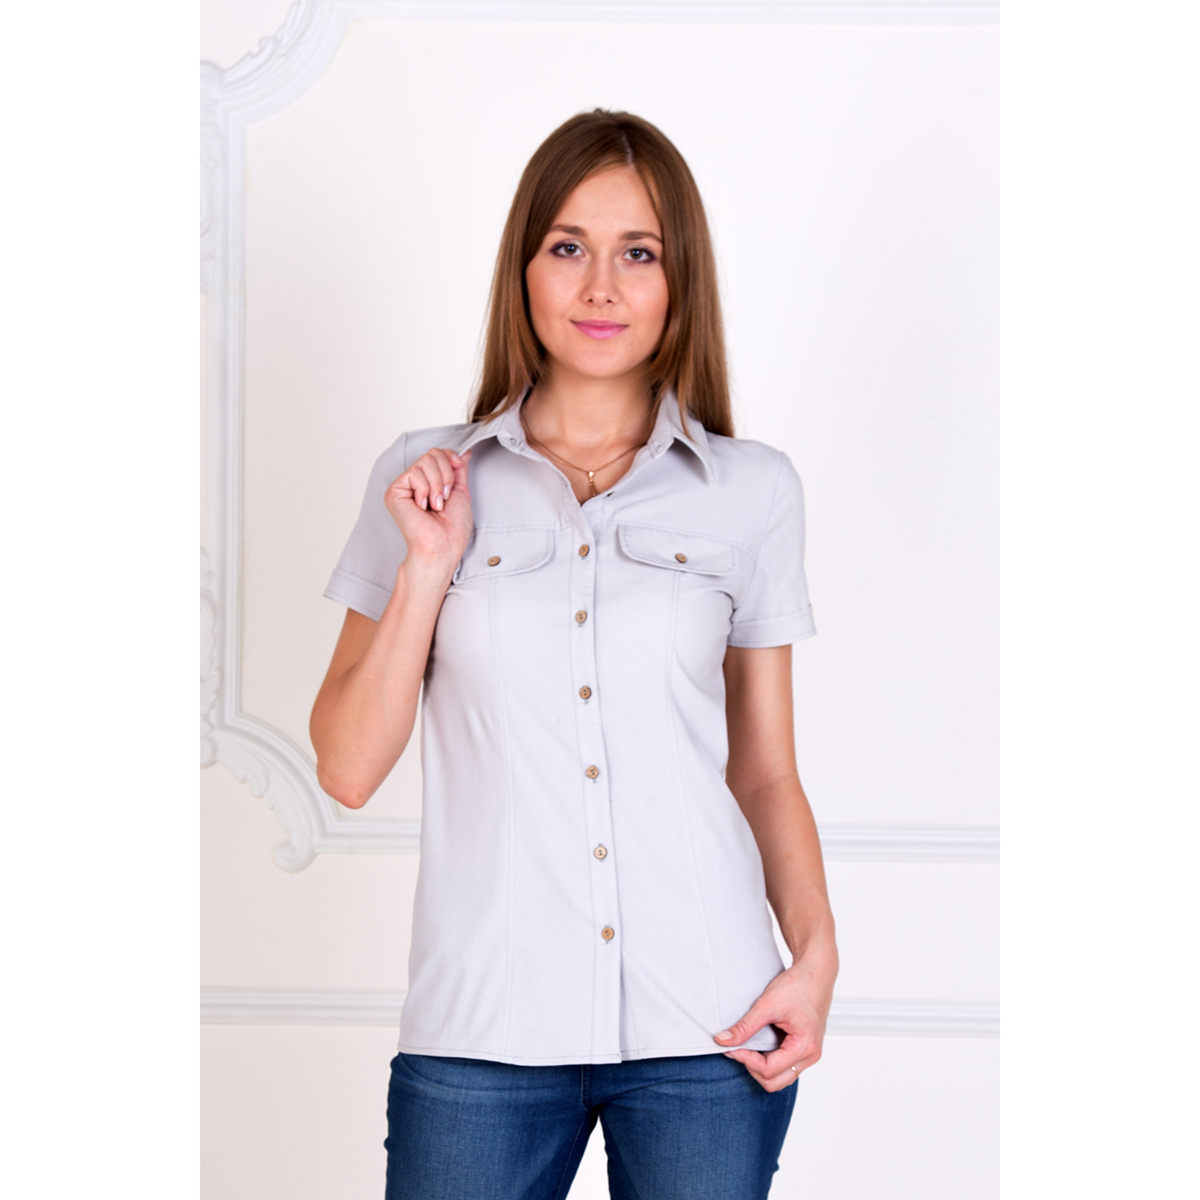 Женская рубашка  Александра  Серый, размер 40 - Женская одежда артикул: 14951